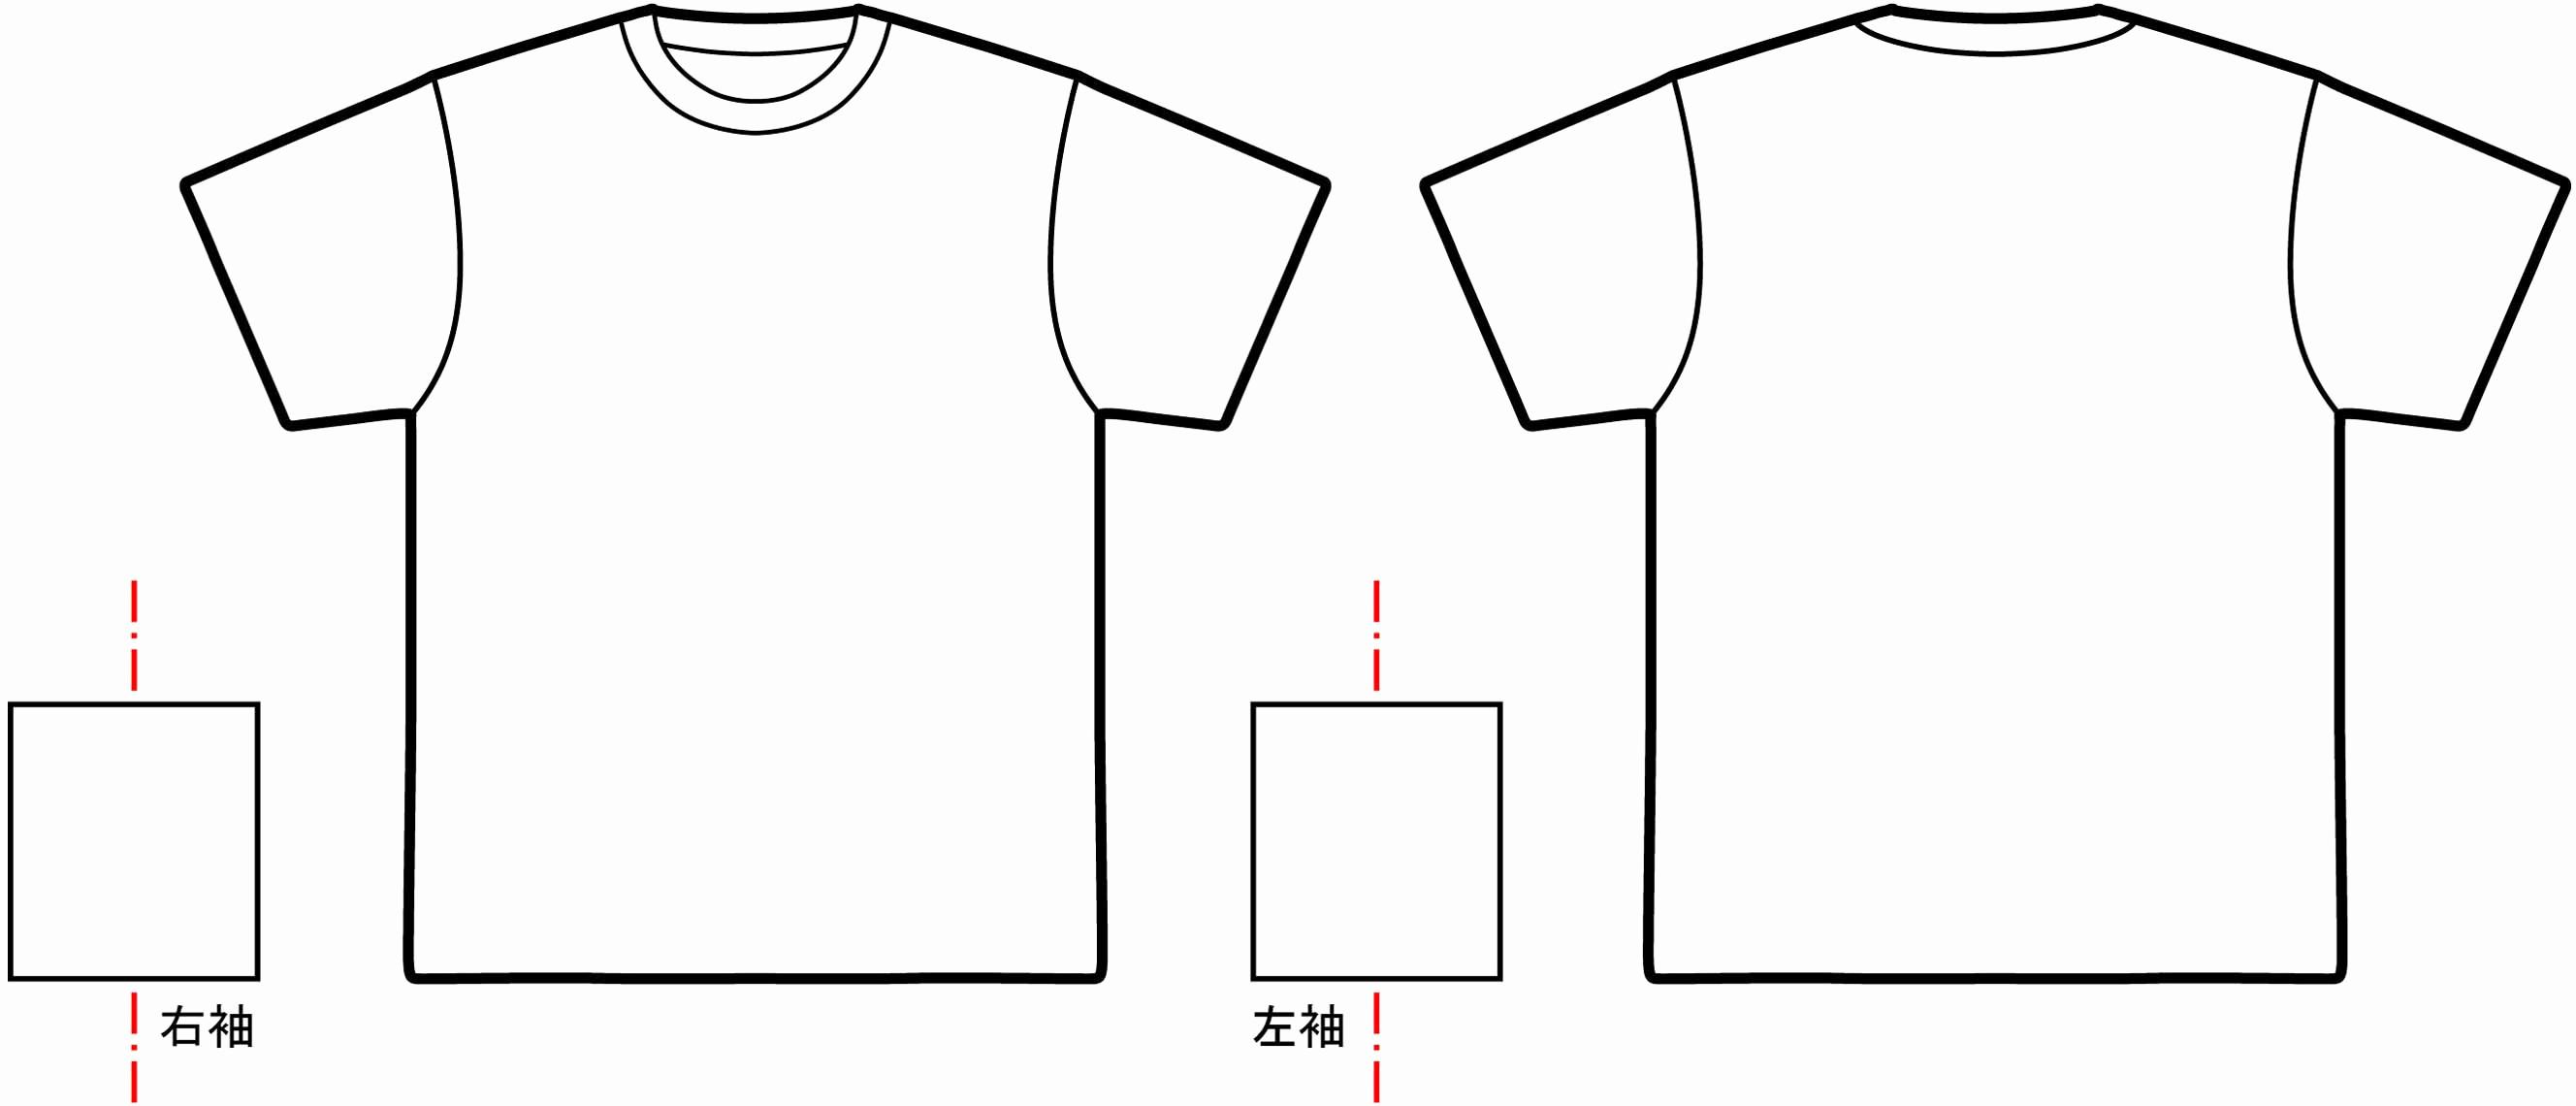 T Shirt Template Illustrator New T Shirt Template Illustrator